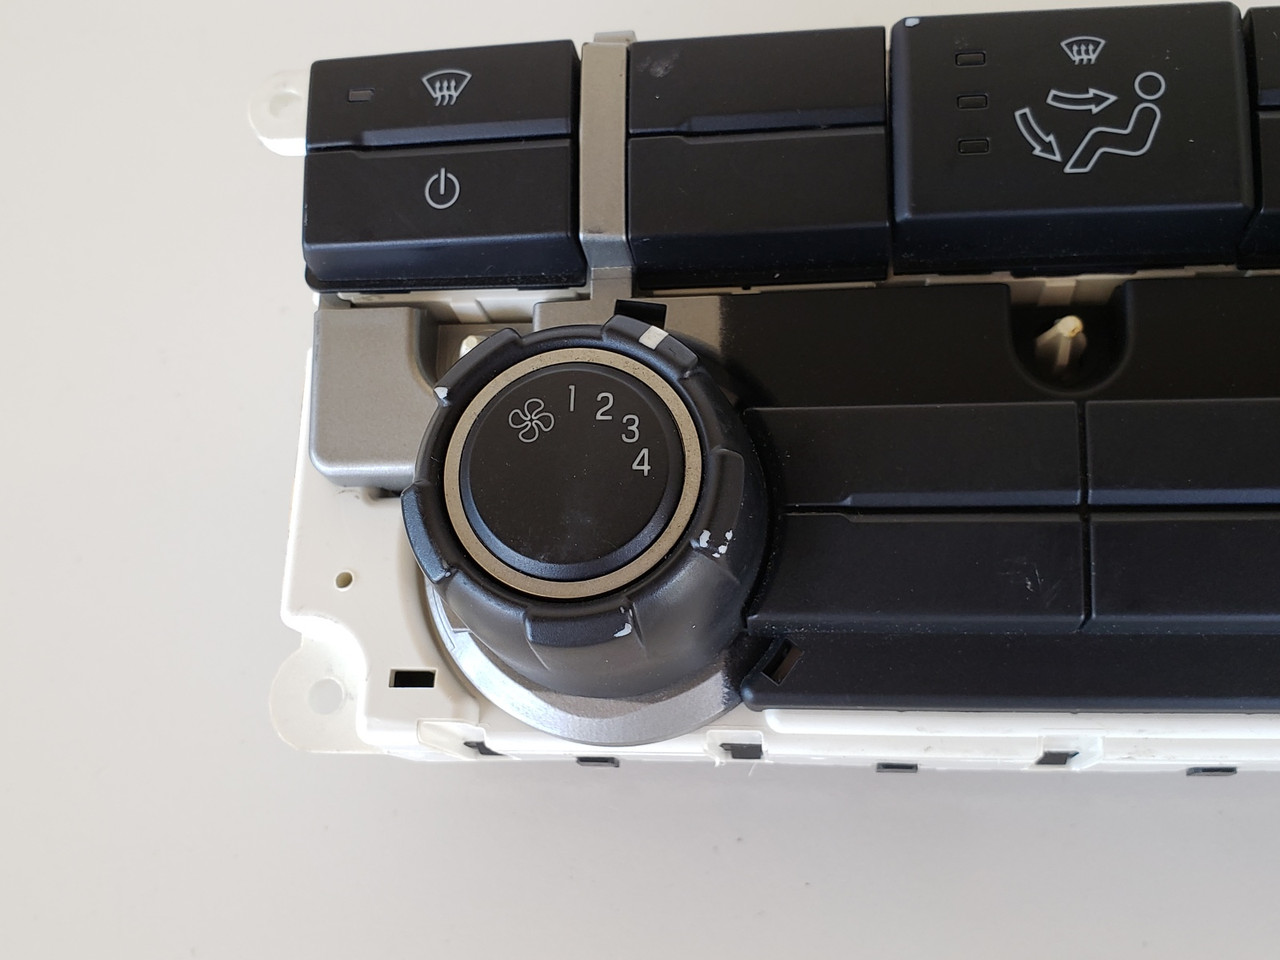 13-14 F-150 F150 DL3T-19980-AA Climate Control Panel Temperature Unit A/C Heater